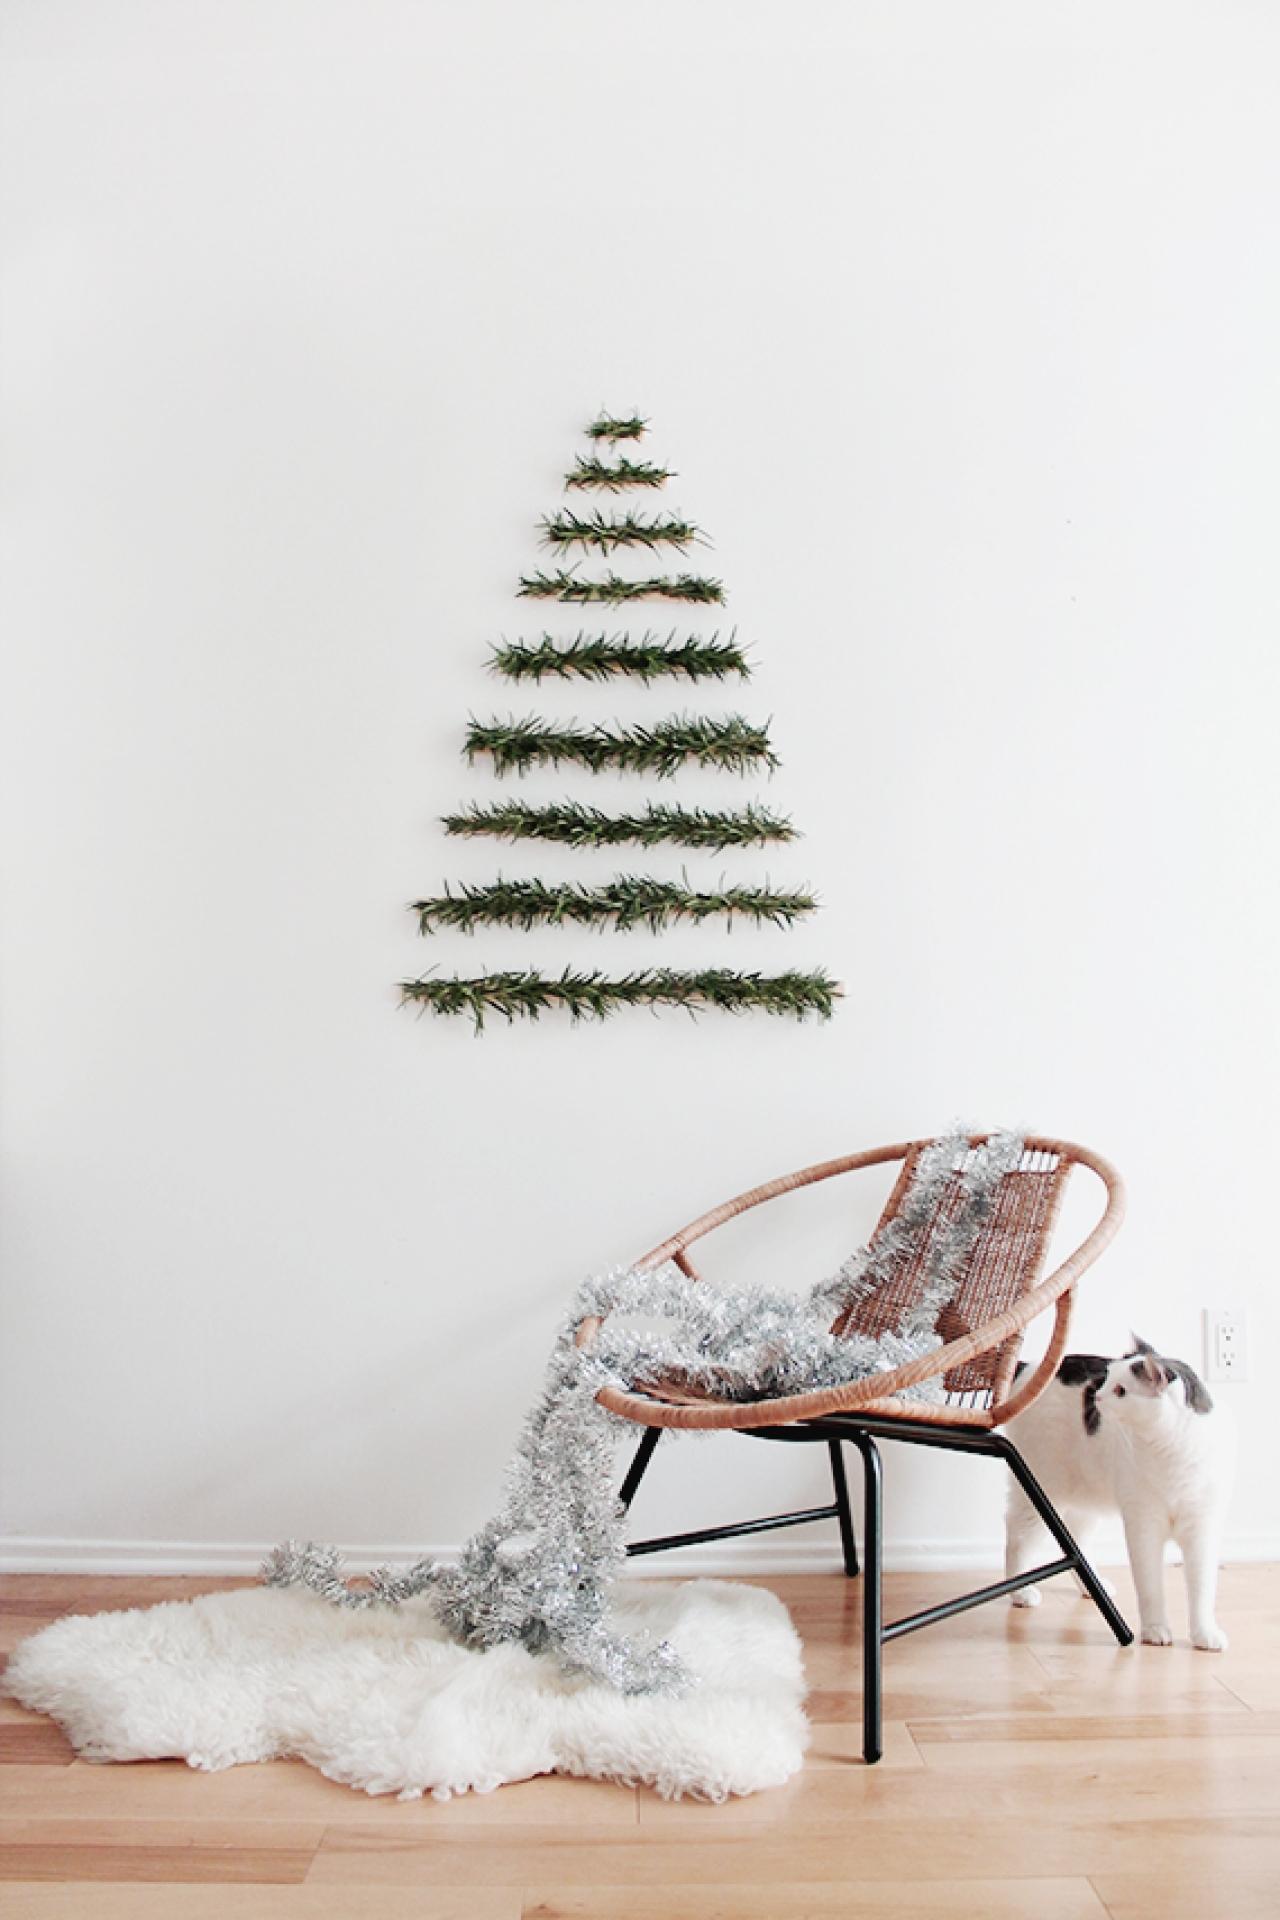 20 id es d co r aliser avec des branches de sapin. Black Bedroom Furniture Sets. Home Design Ideas